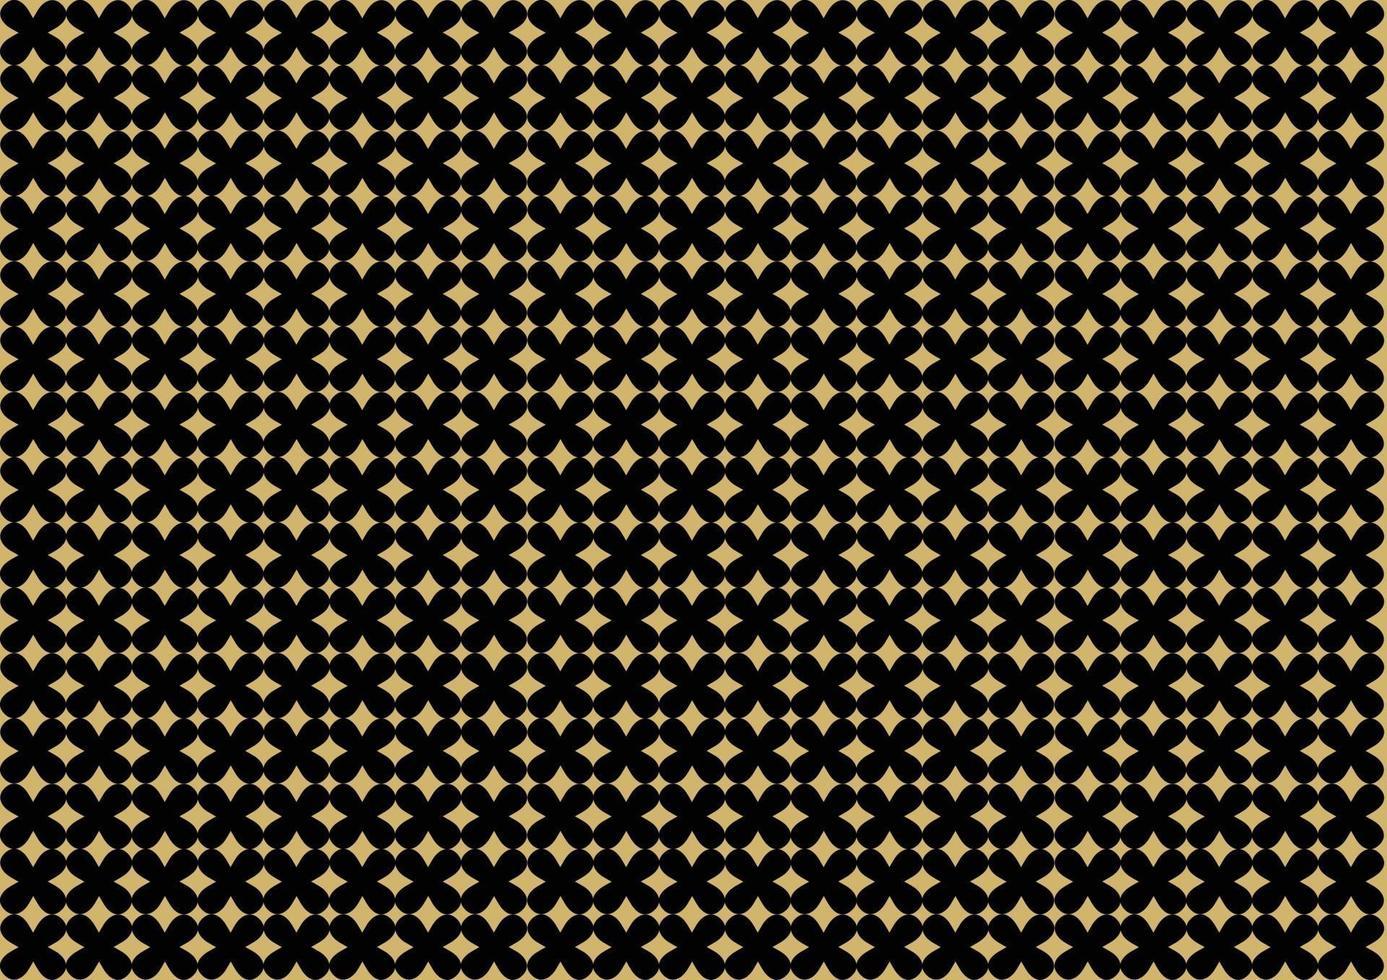 gyllene konsistens. sömlöst geometriskt mönster. abstrakt gyllene bakgrund. retro mönster hipster vektor